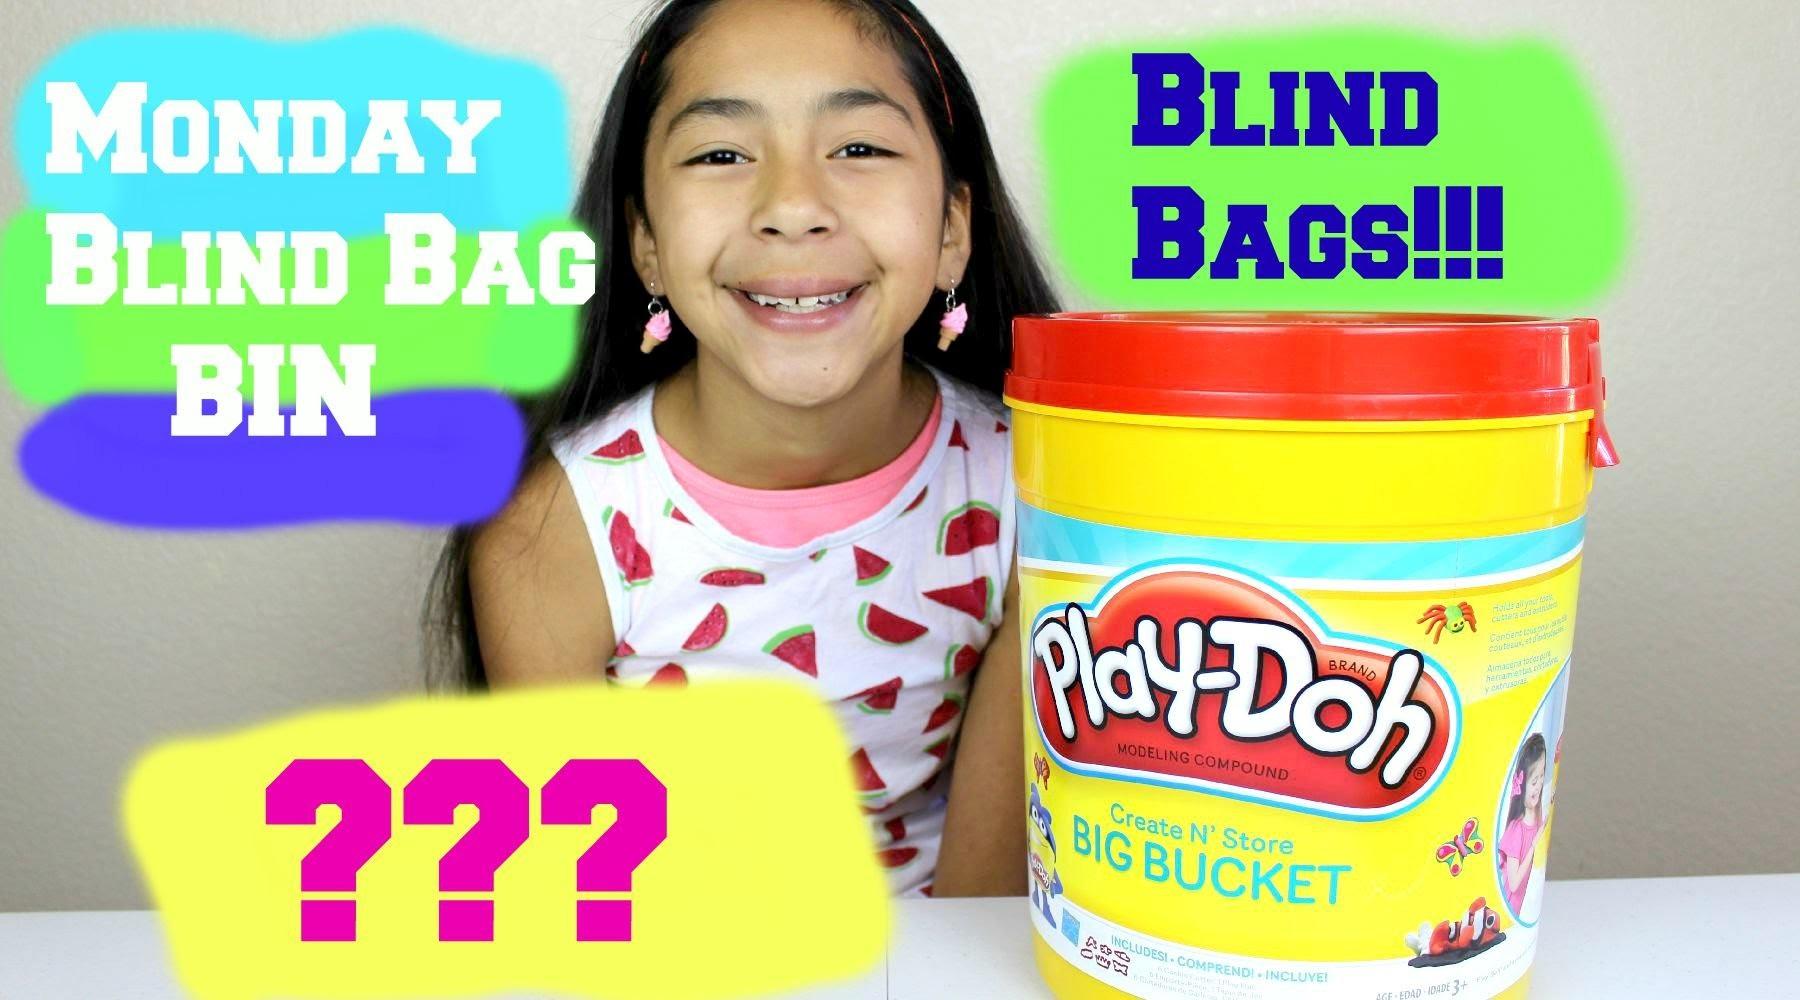 Monday Blind Bag Bin  BLIND BAGS!!! Kinder Joy LPS Shopkis| Care Bears | B2cutecupcakes